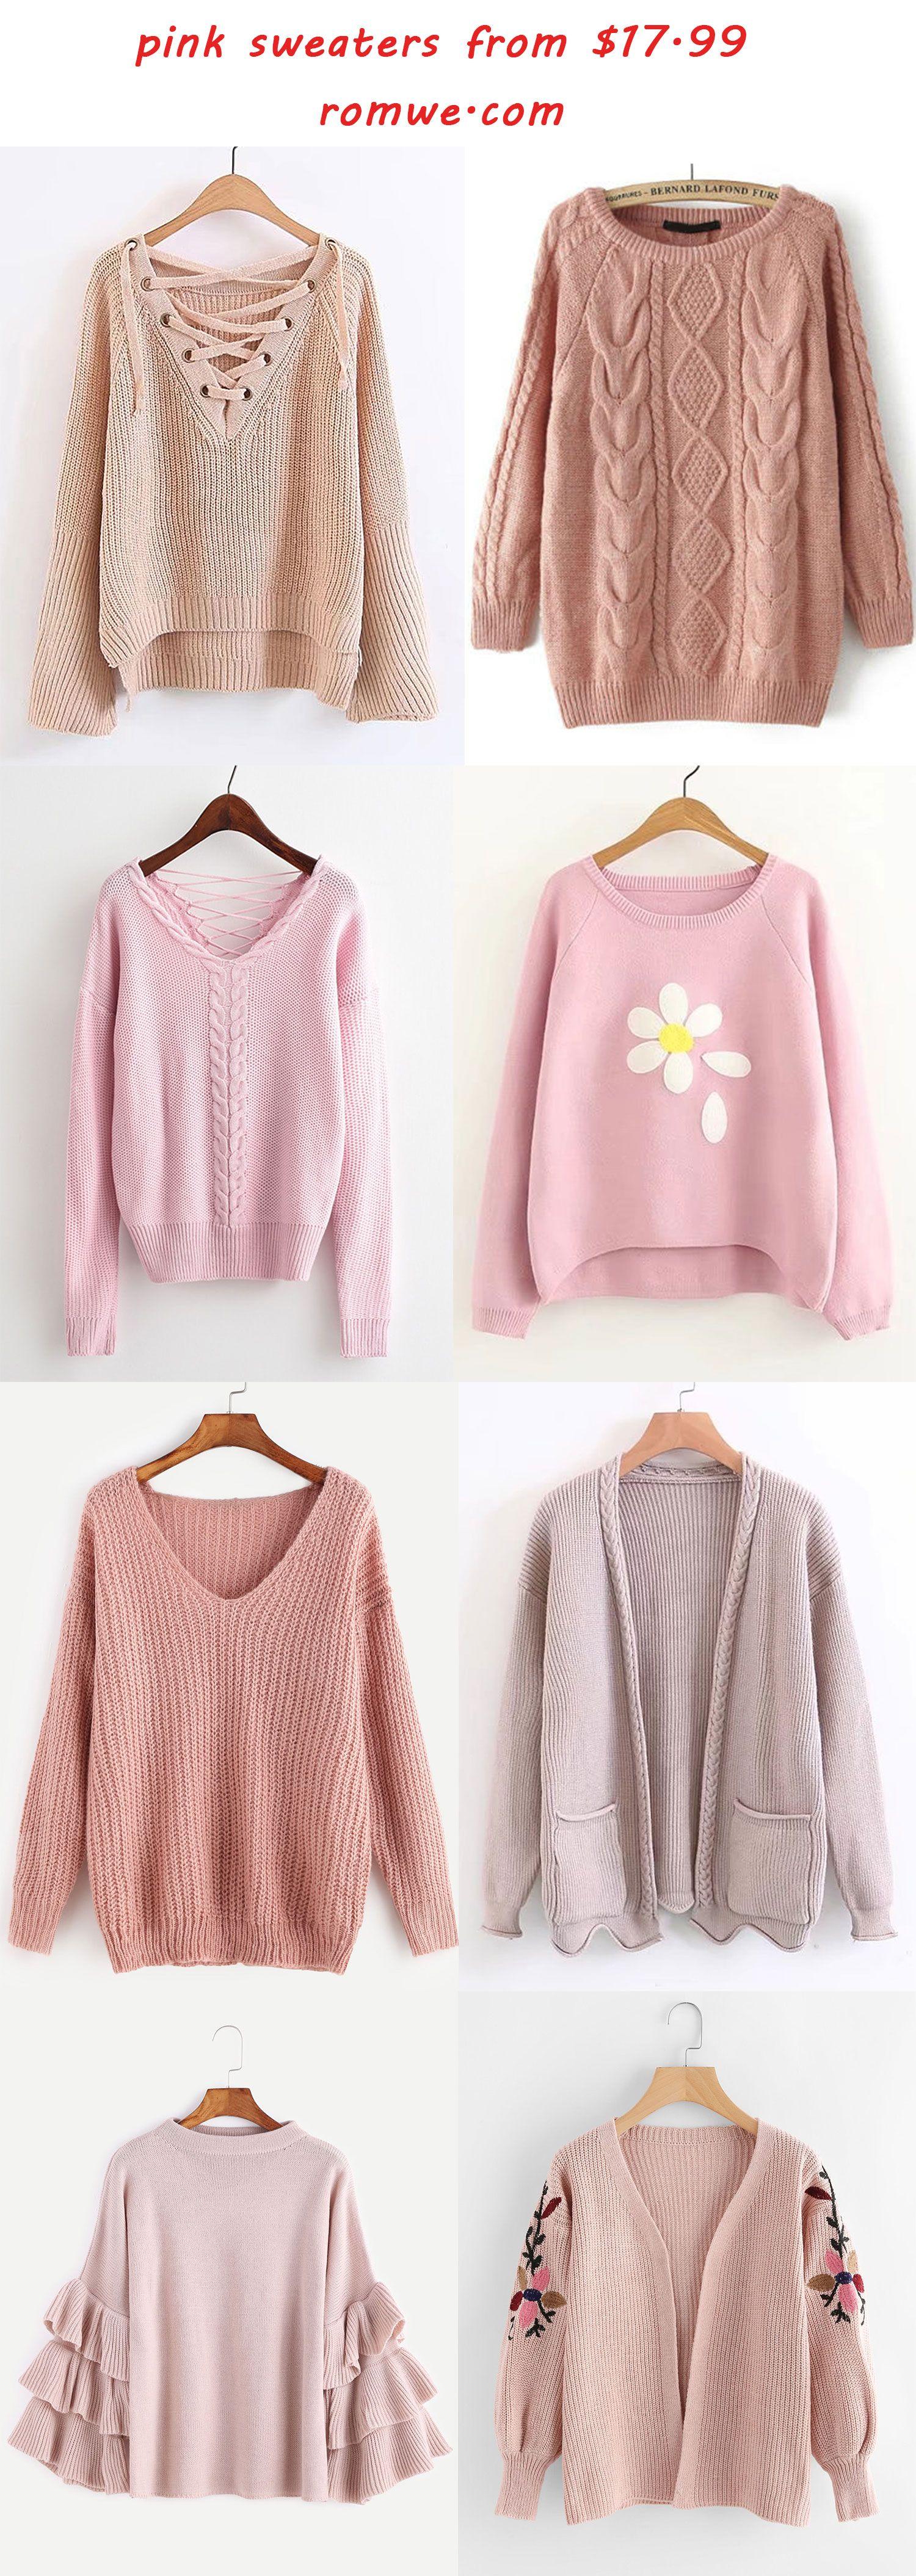 chic & cozy pink sweaters - romwe.com | Romwe Hot Buy | Pinterest ...